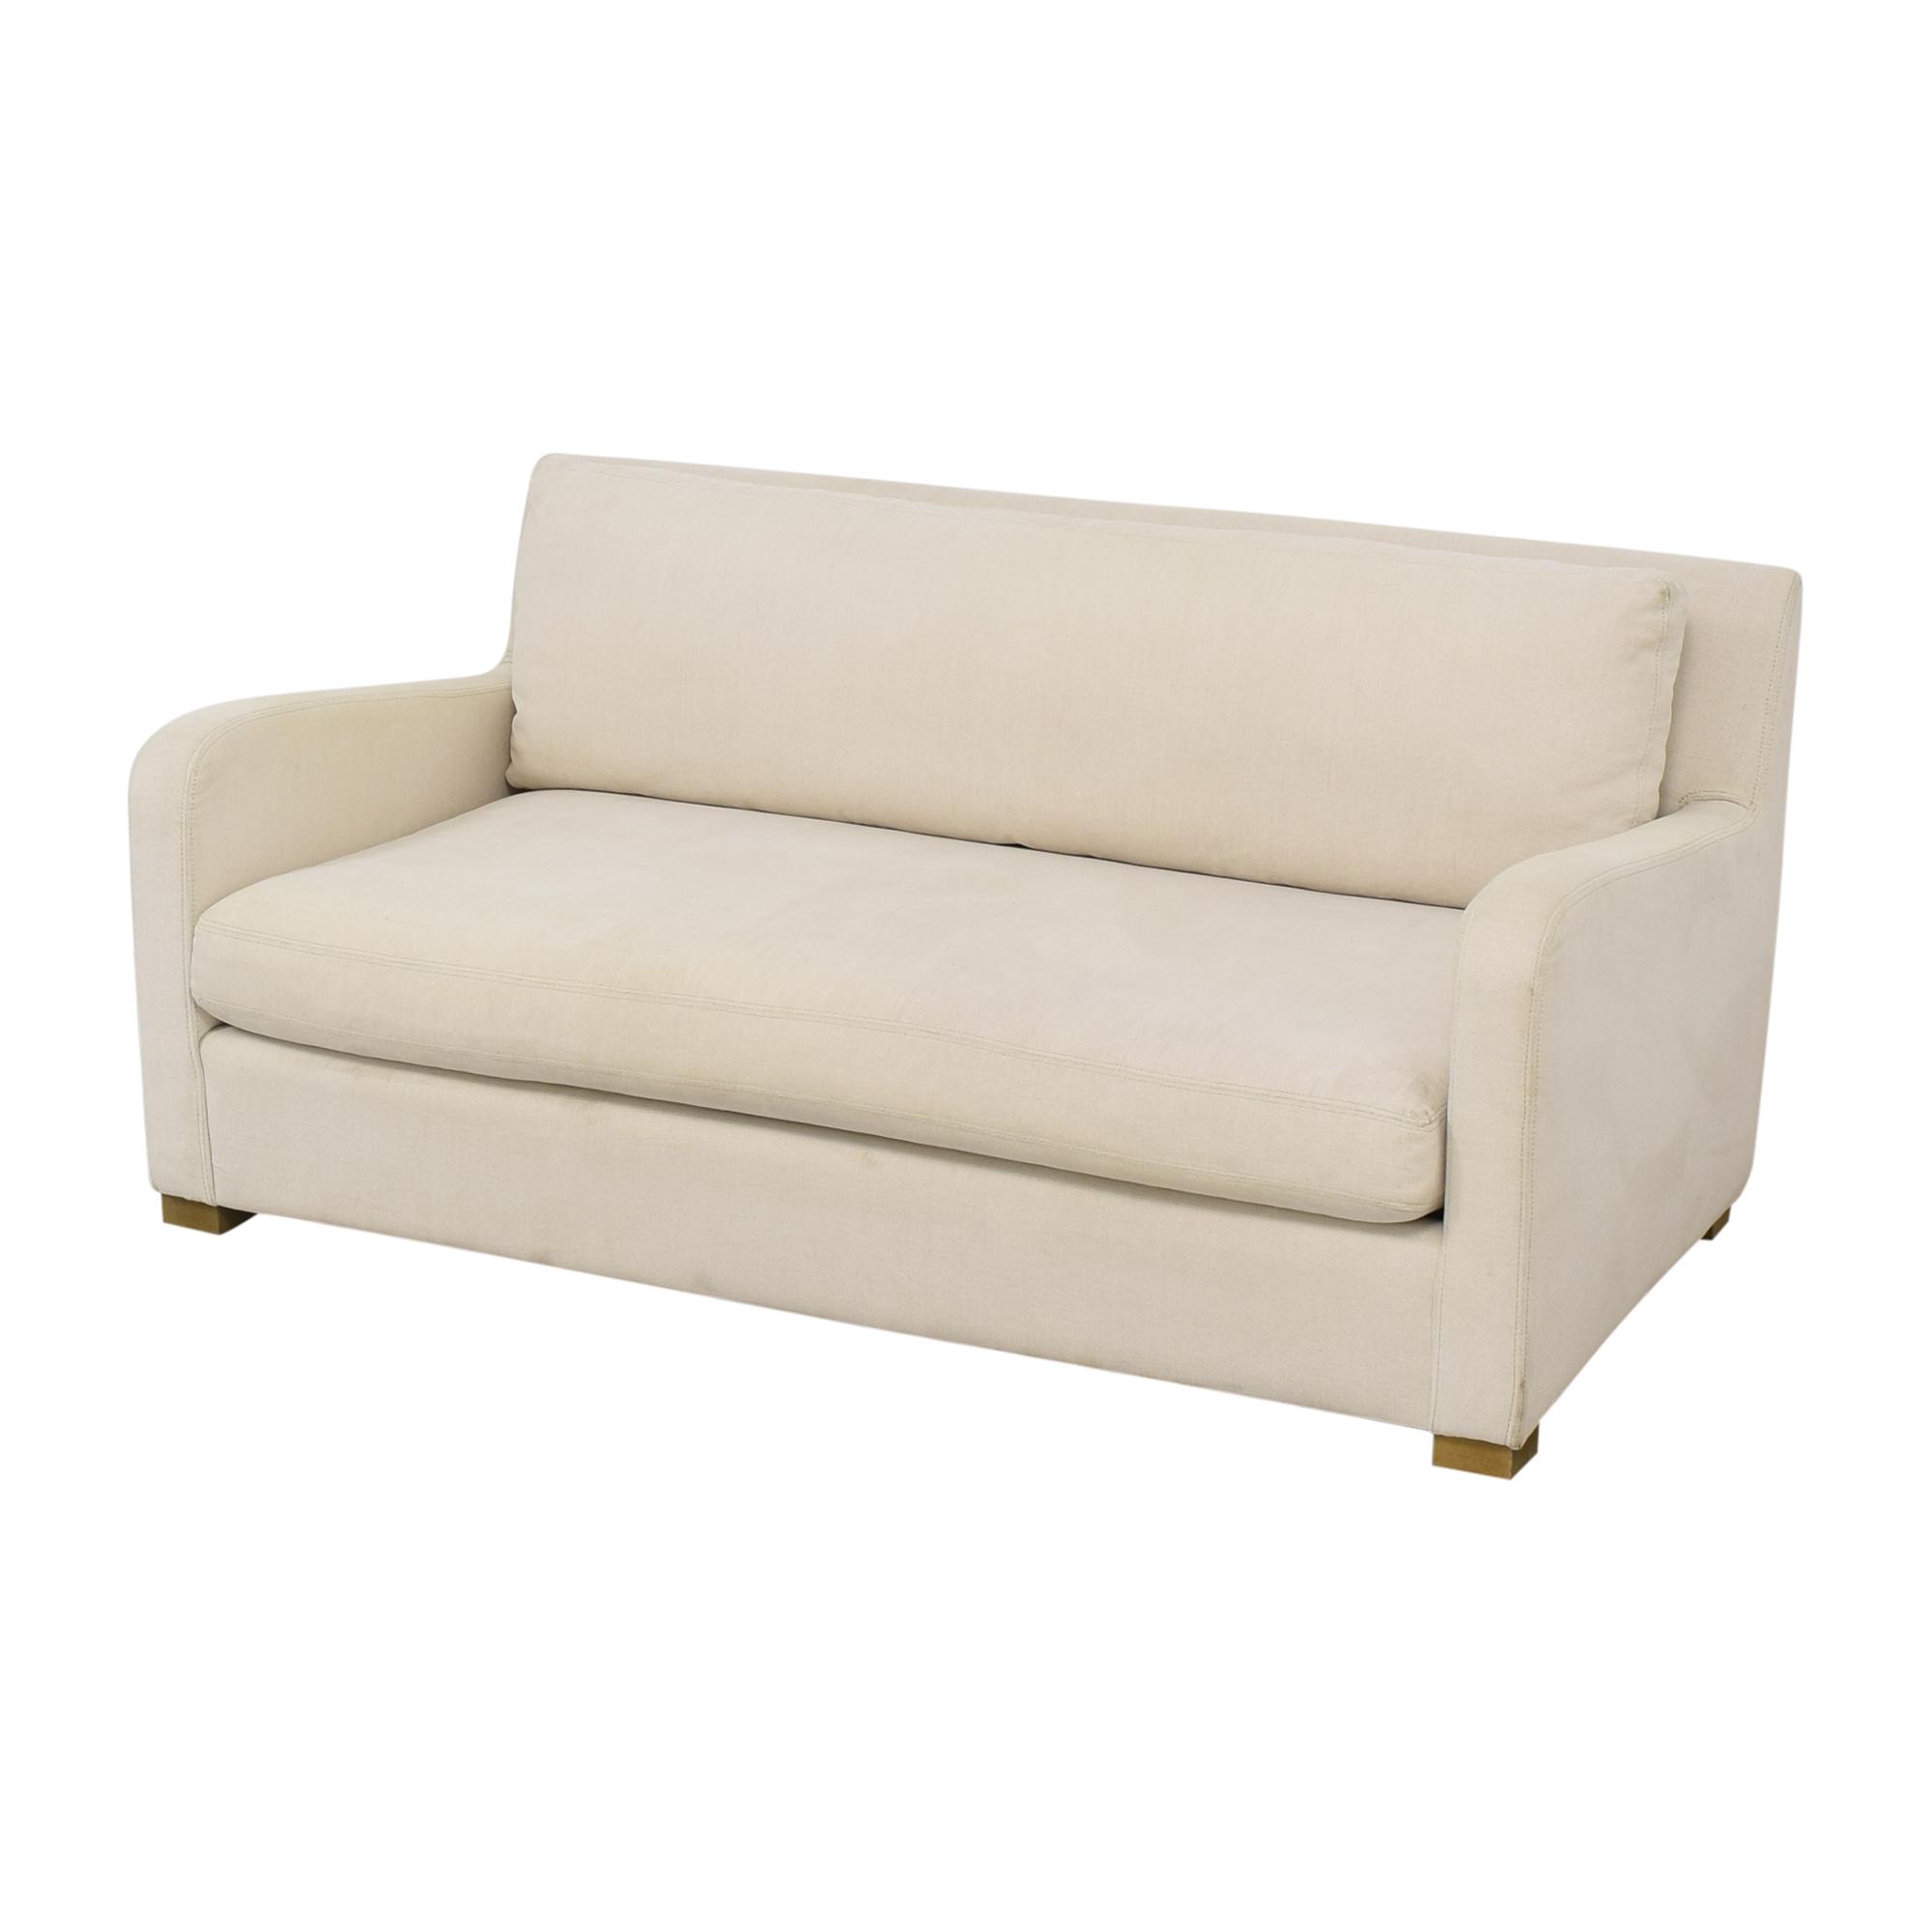 Restoration Hardware Belgian Slope Arm Sofa / Classic Sofas